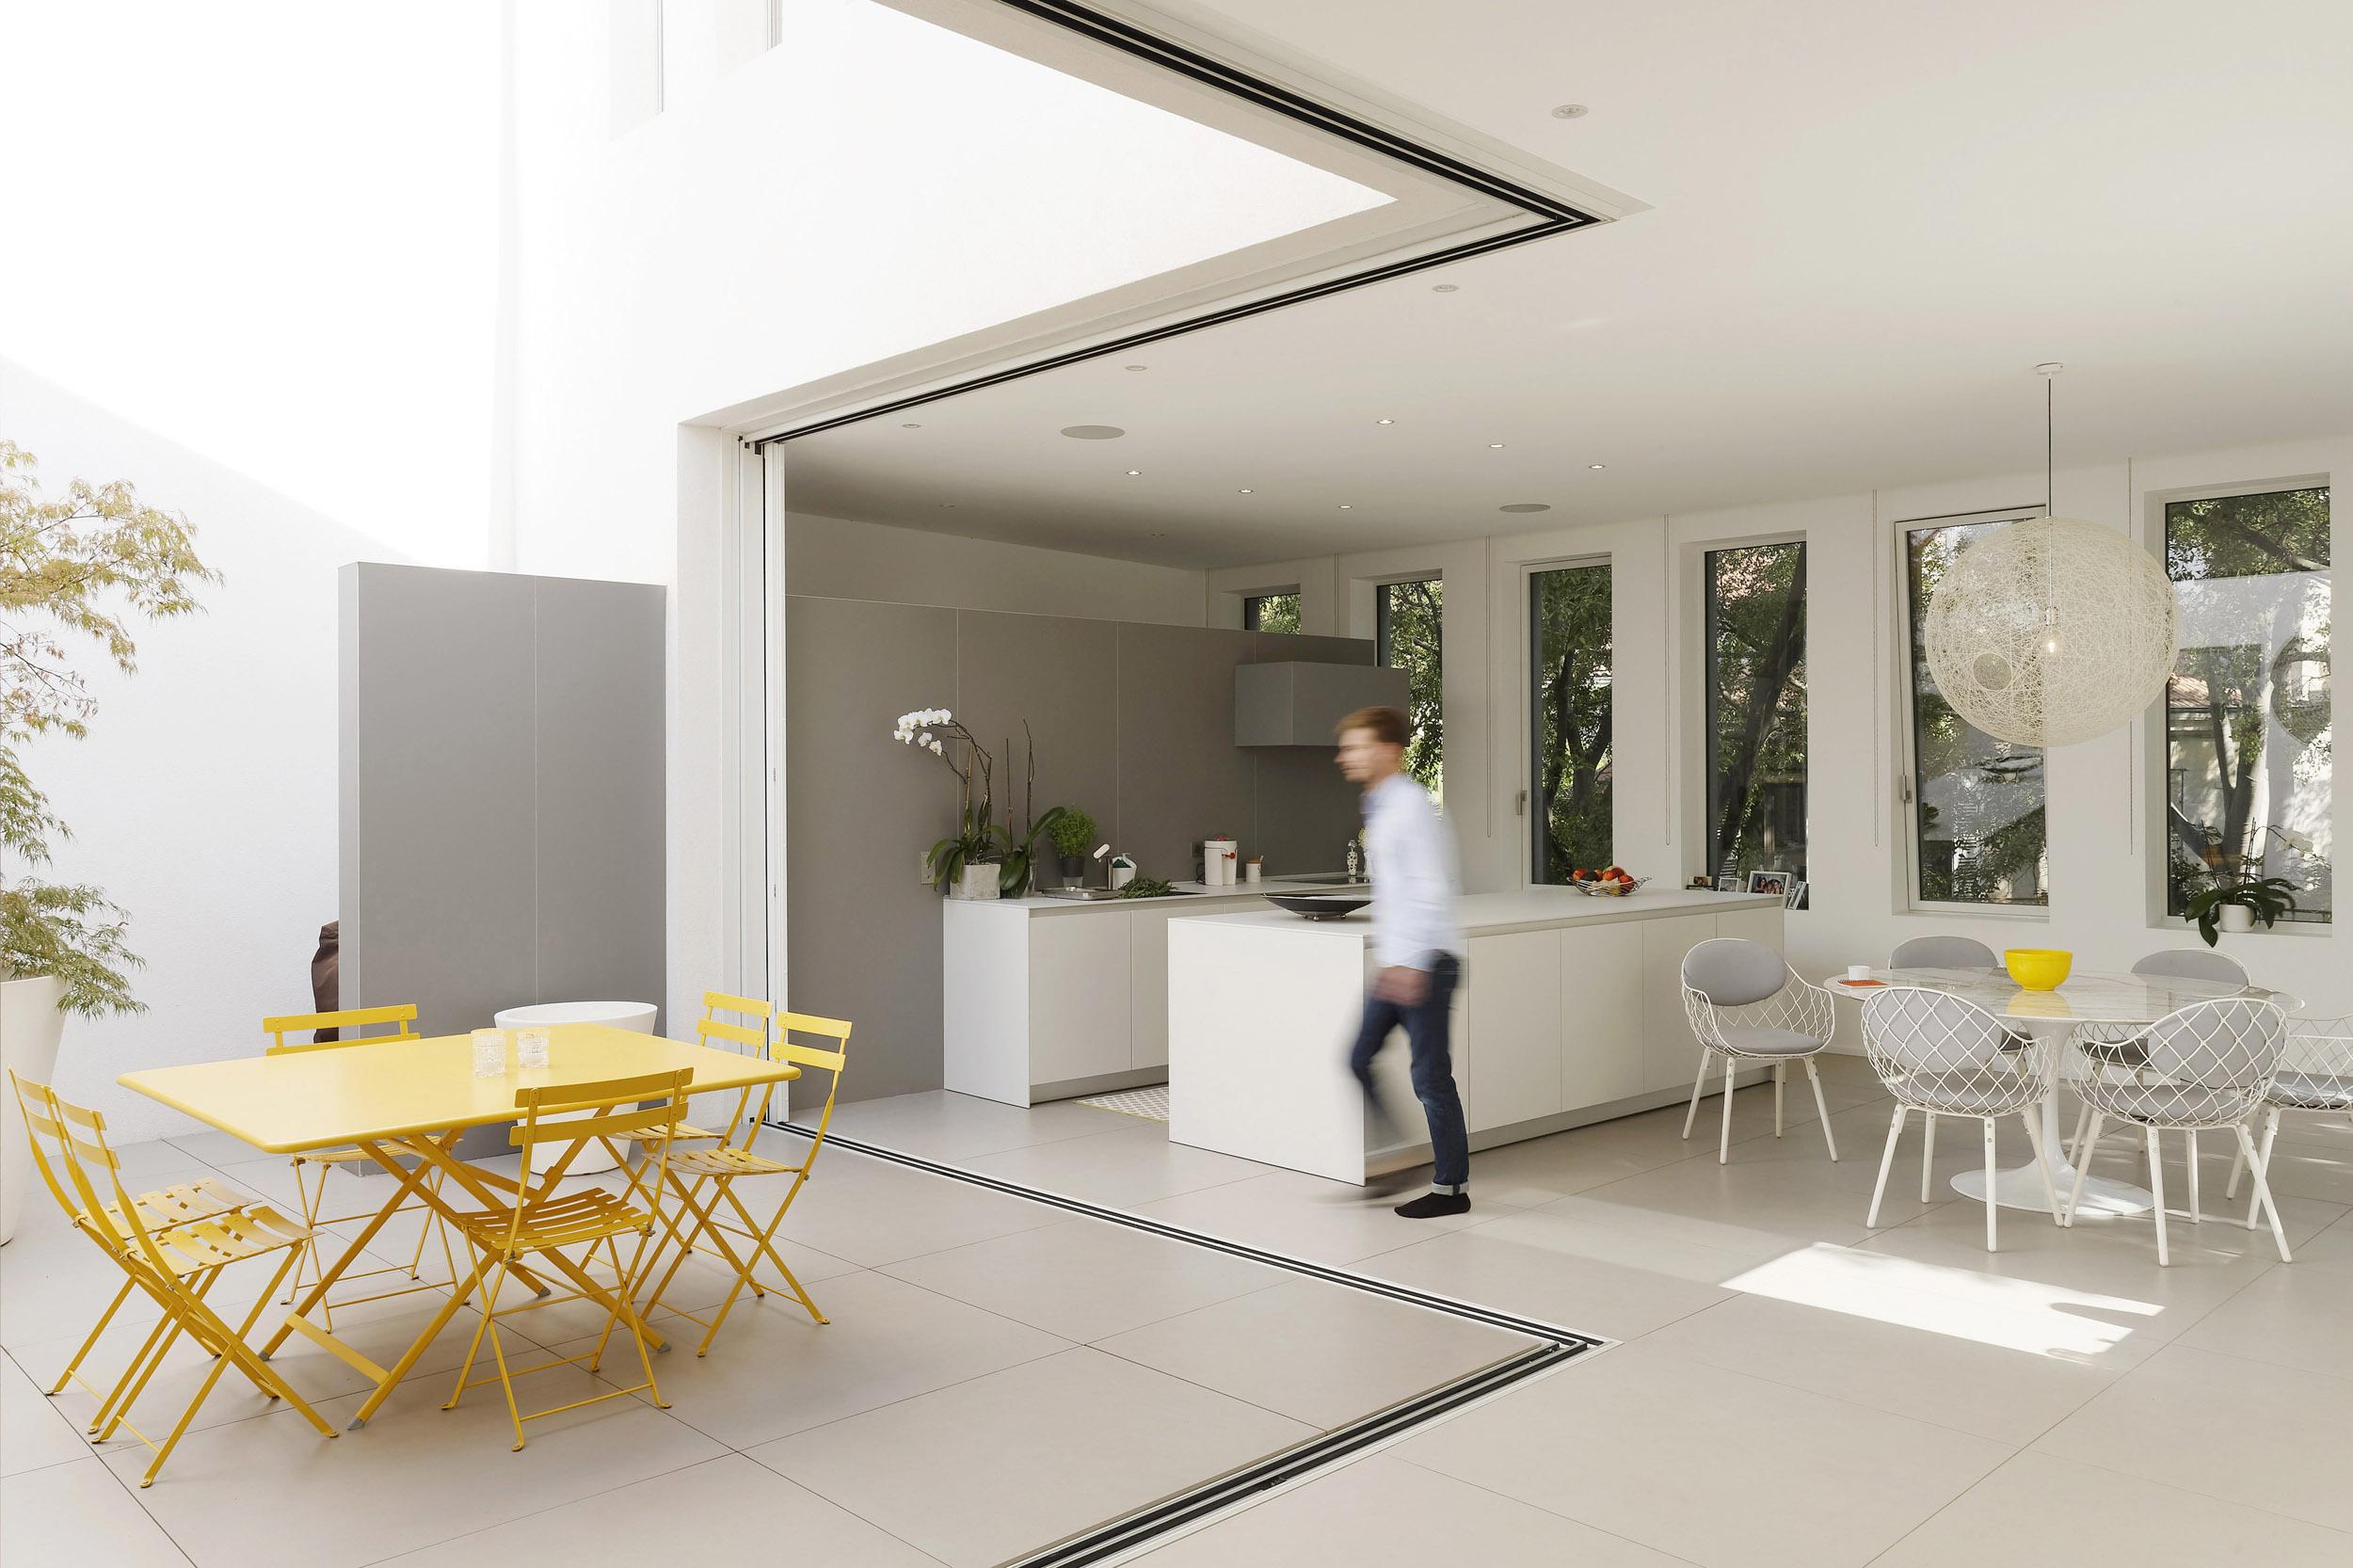 ROULLE OLIVEIRA ARCHITECTES | MAISON NIMES | Daniel MOULINET